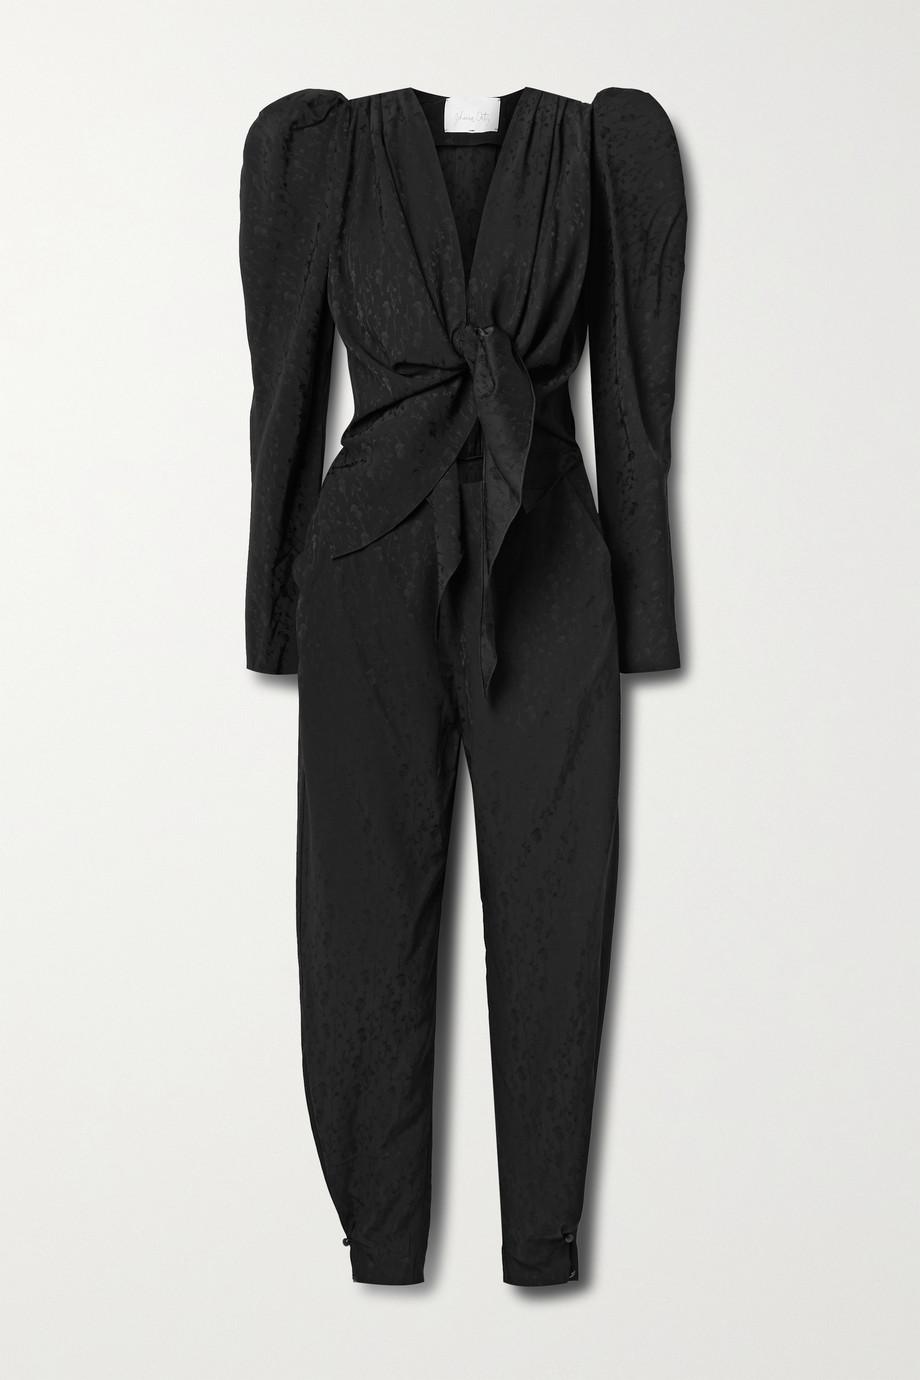 Johanna Ortiz + NET SUSTAIN Splendid Isolation tie-front cutout floral-jacquard jumpsuit